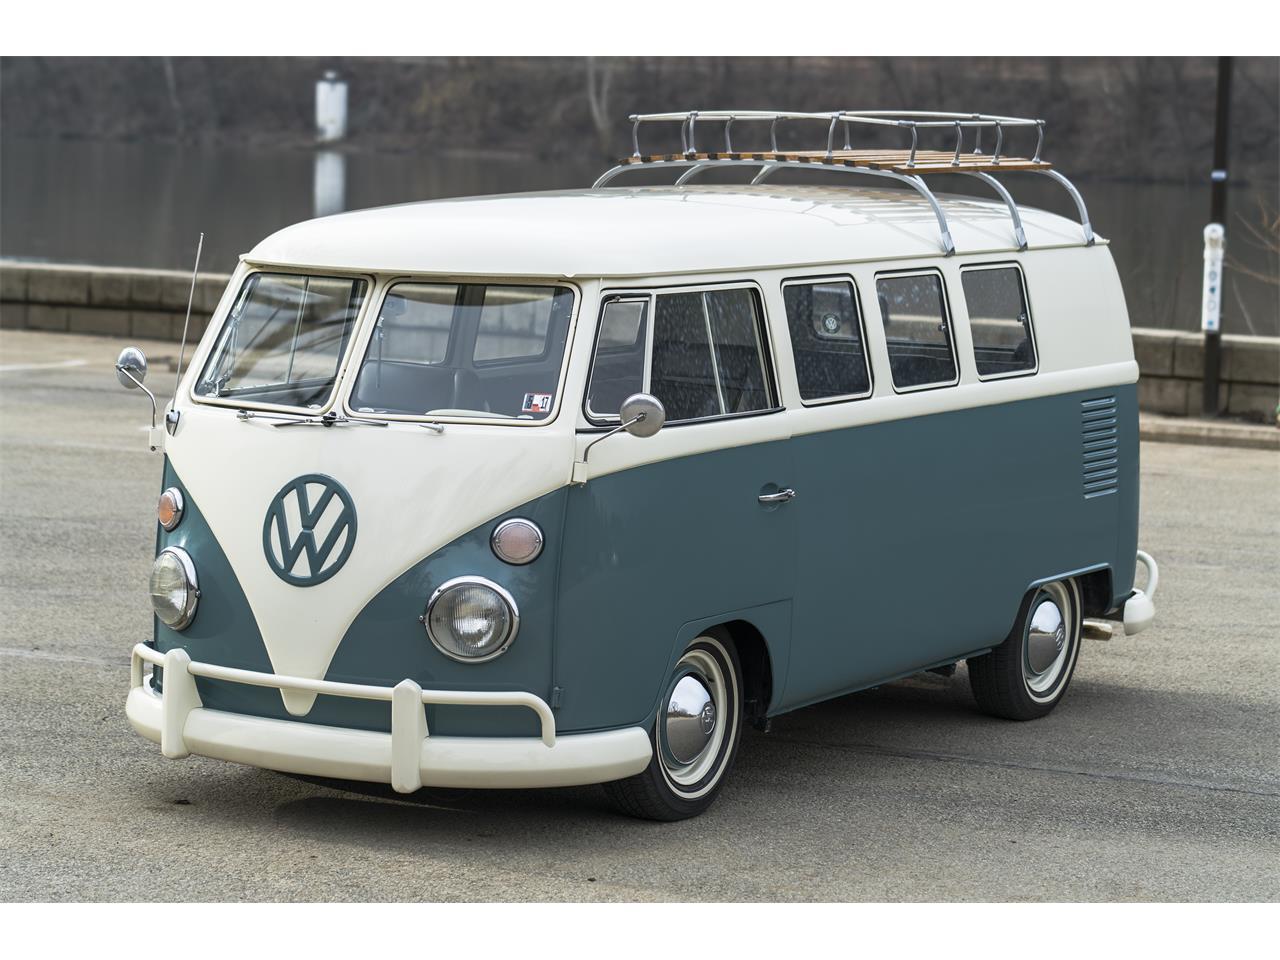 1967 Volkswagen Bus For Sale Classiccars Com Cc 1203858